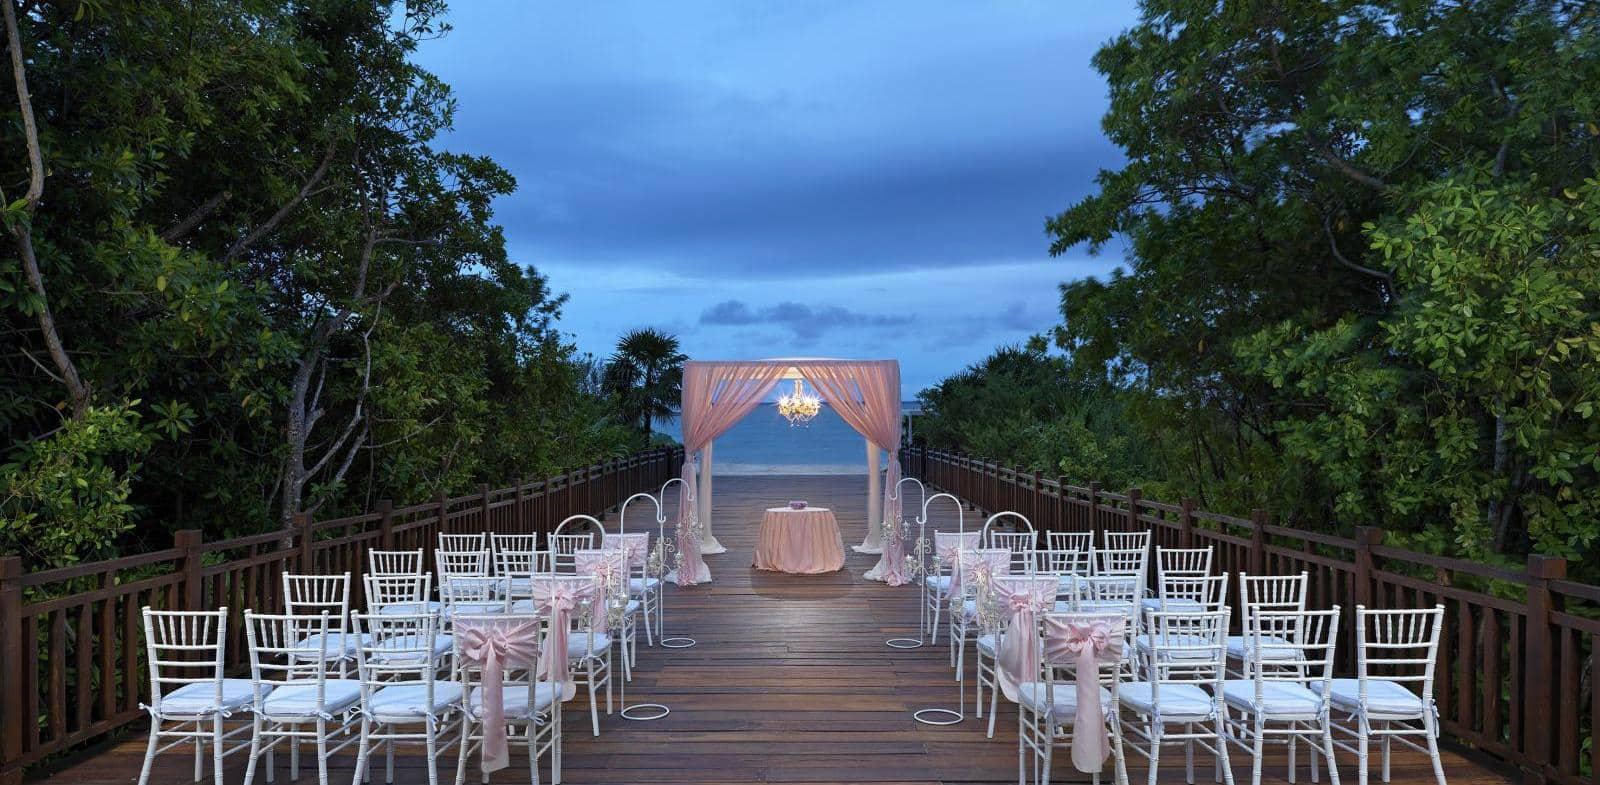 Wedding at The Paradisus resort in Playa del Carmen